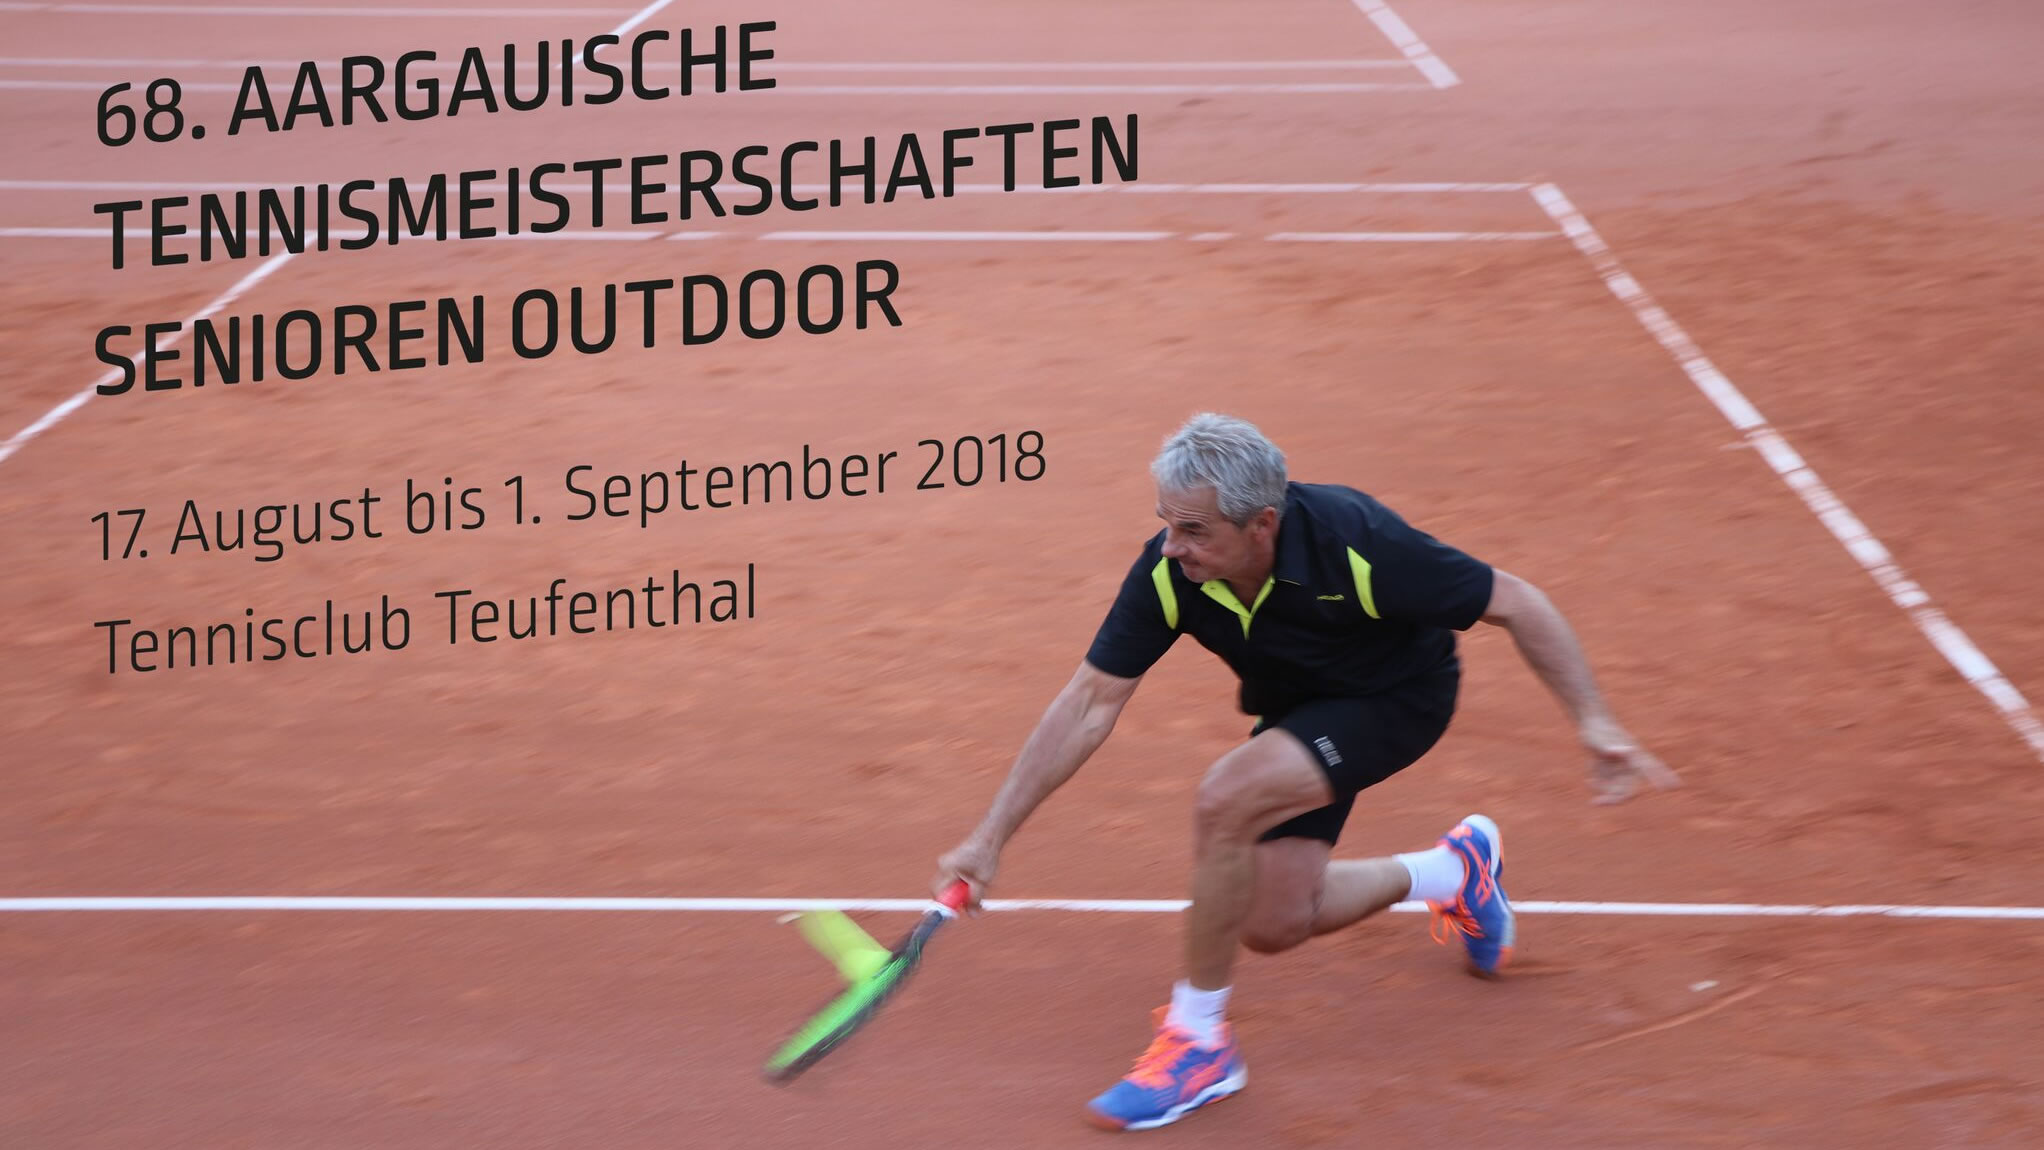 Aargauer Tennis Senioren Meisterschaften, Teufenthal AG